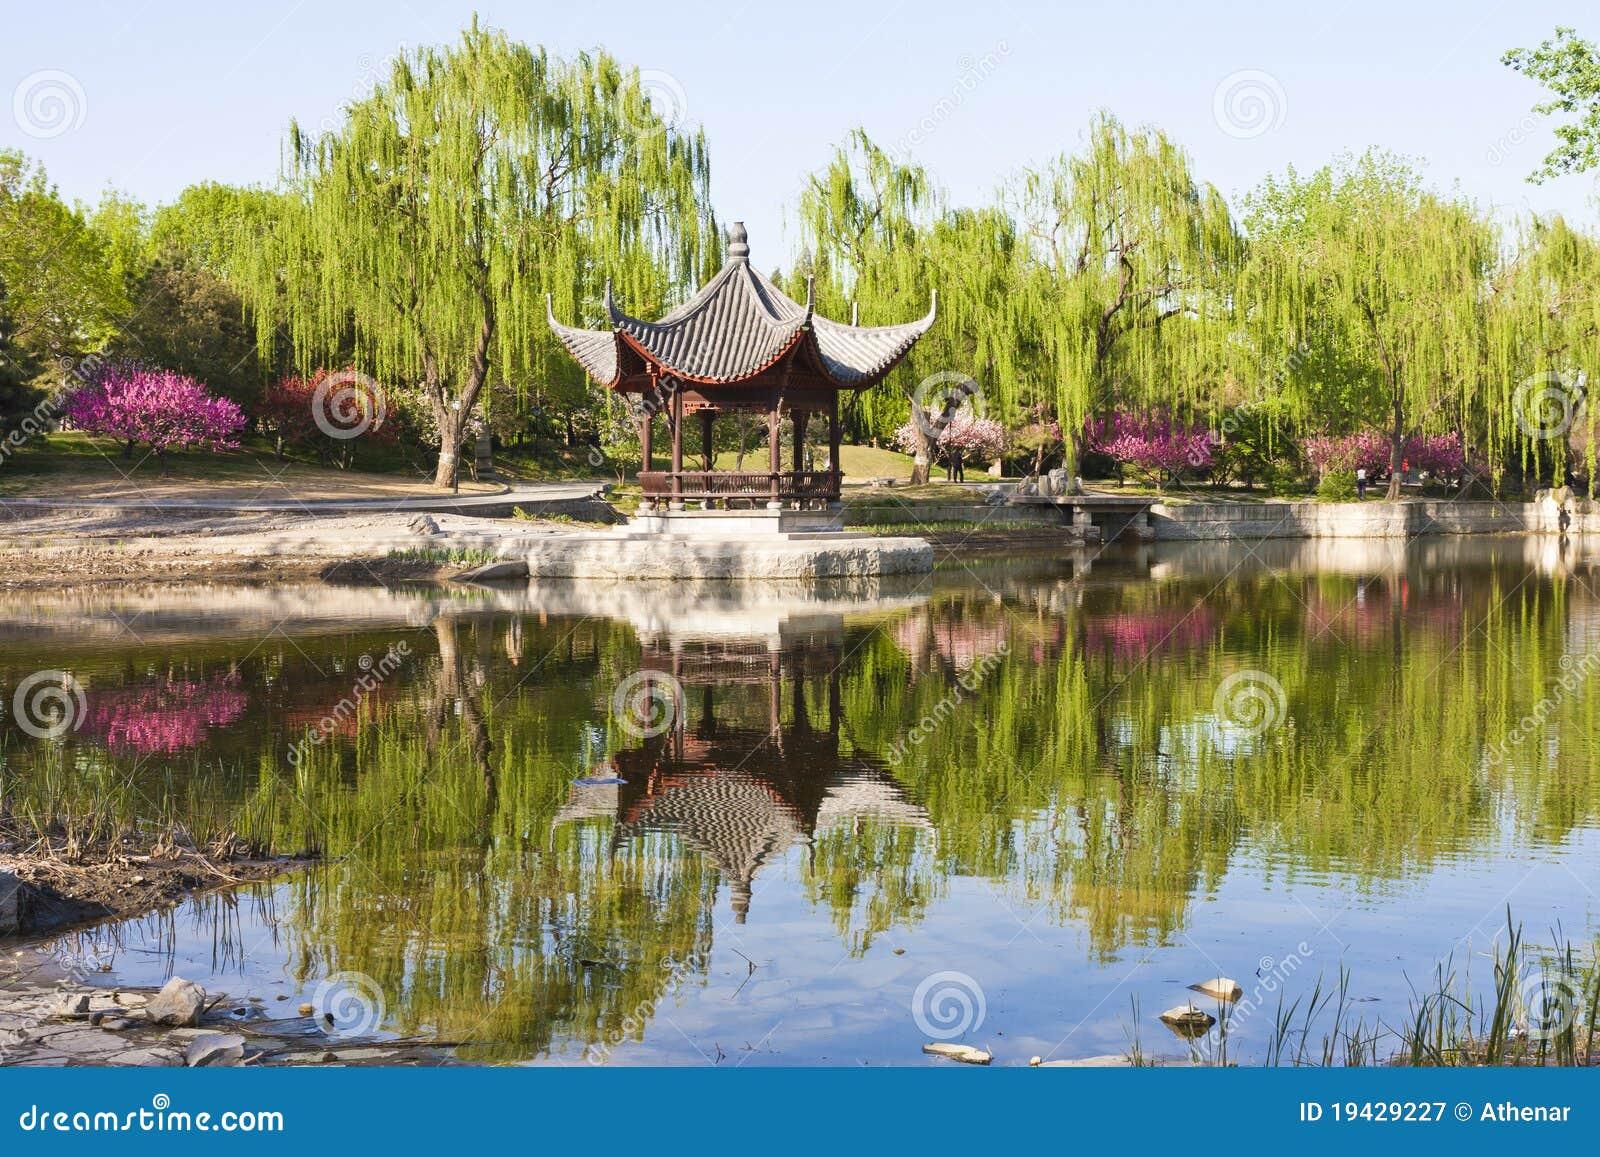 Landscape of Chinese pavilion